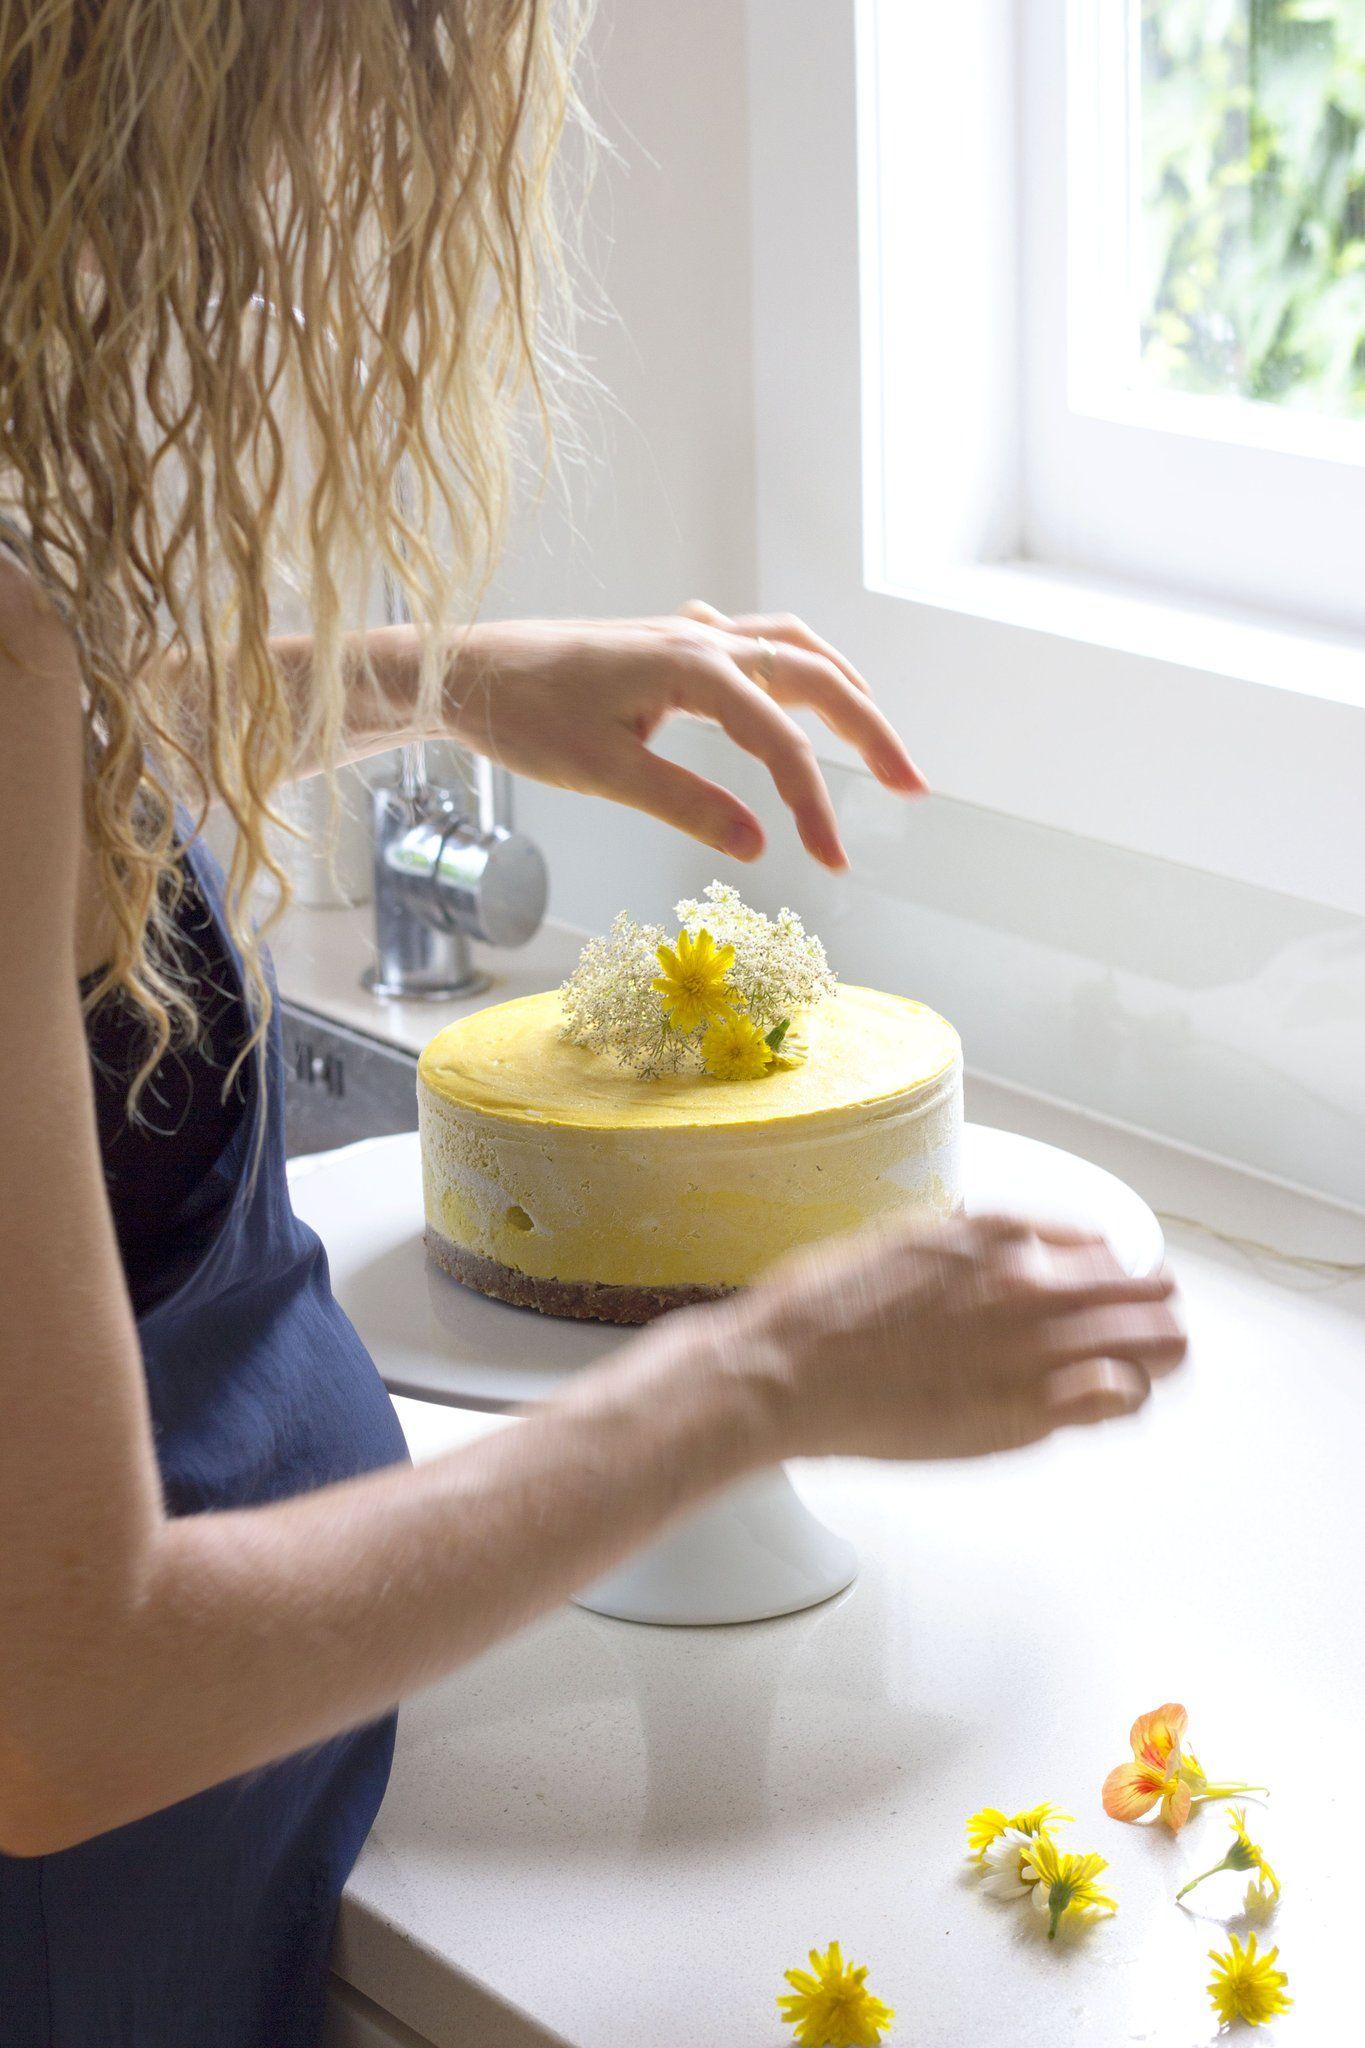 30-minute deliciously creamy Mango and Turmeric Cheesecake summer dessert #healthy #vegan #mango #cheesecake #recipe #dairyfree #sugarfree #glutenfree #begoodorganics